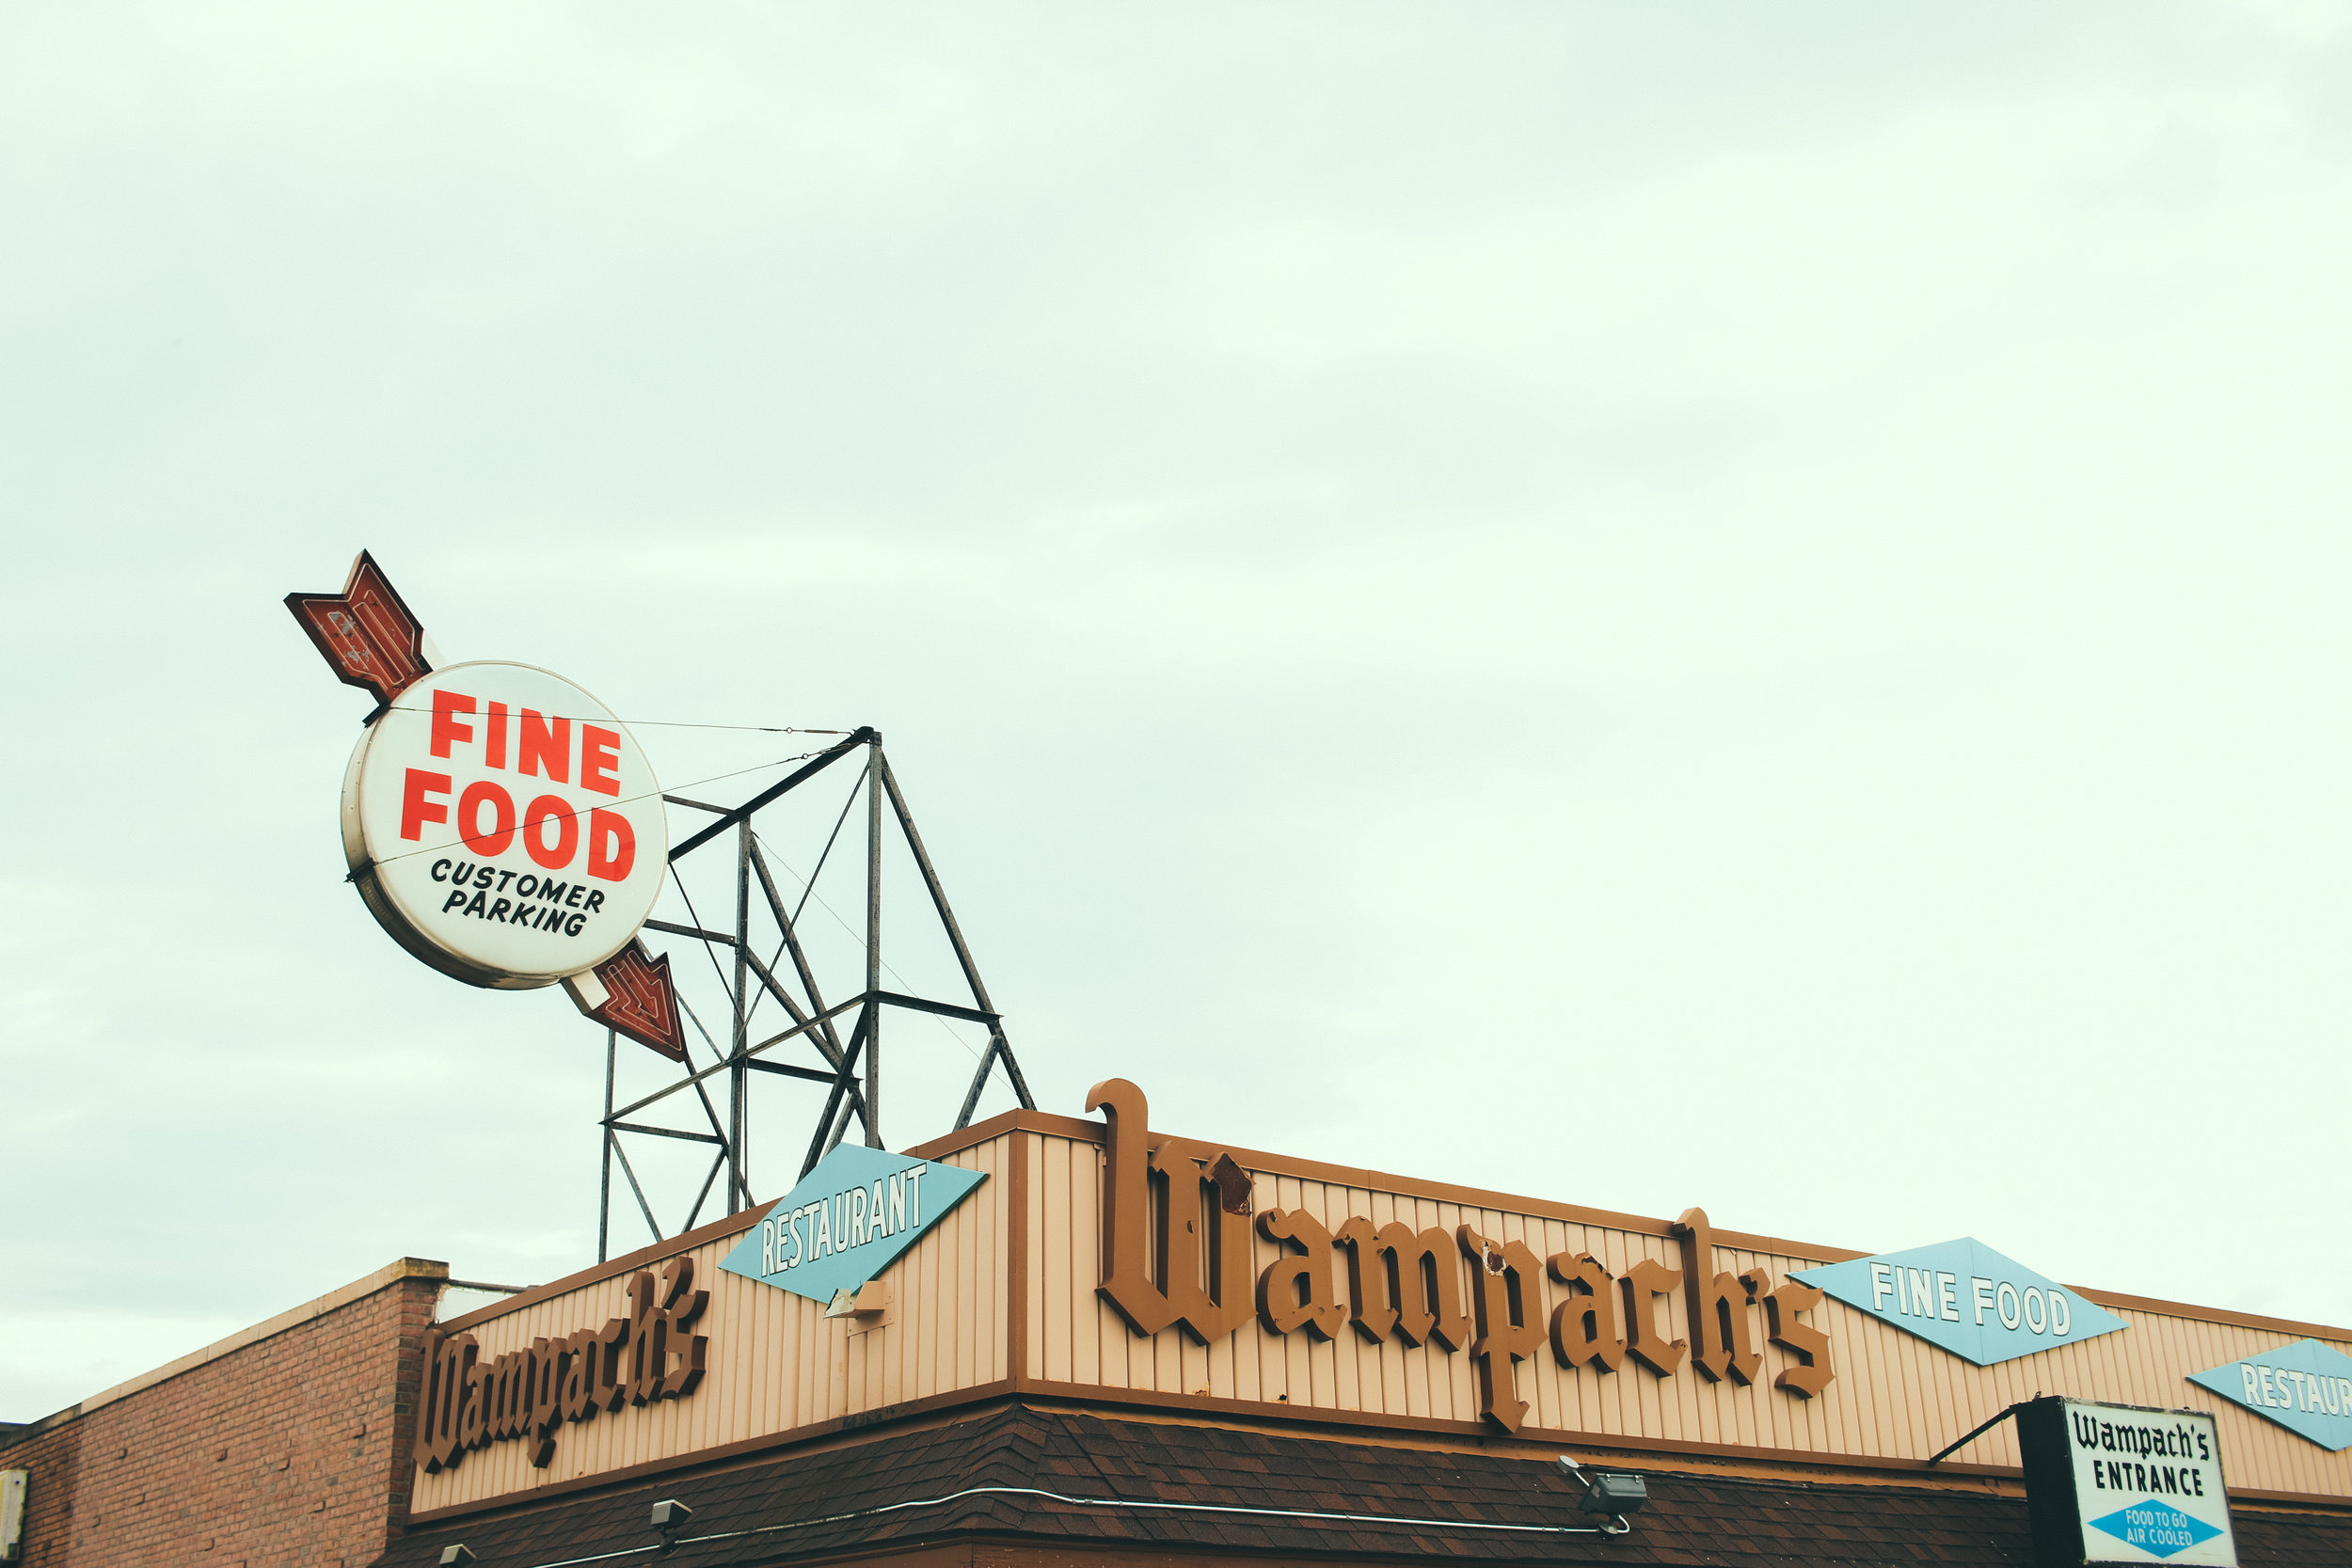 Wampach's iconic signage